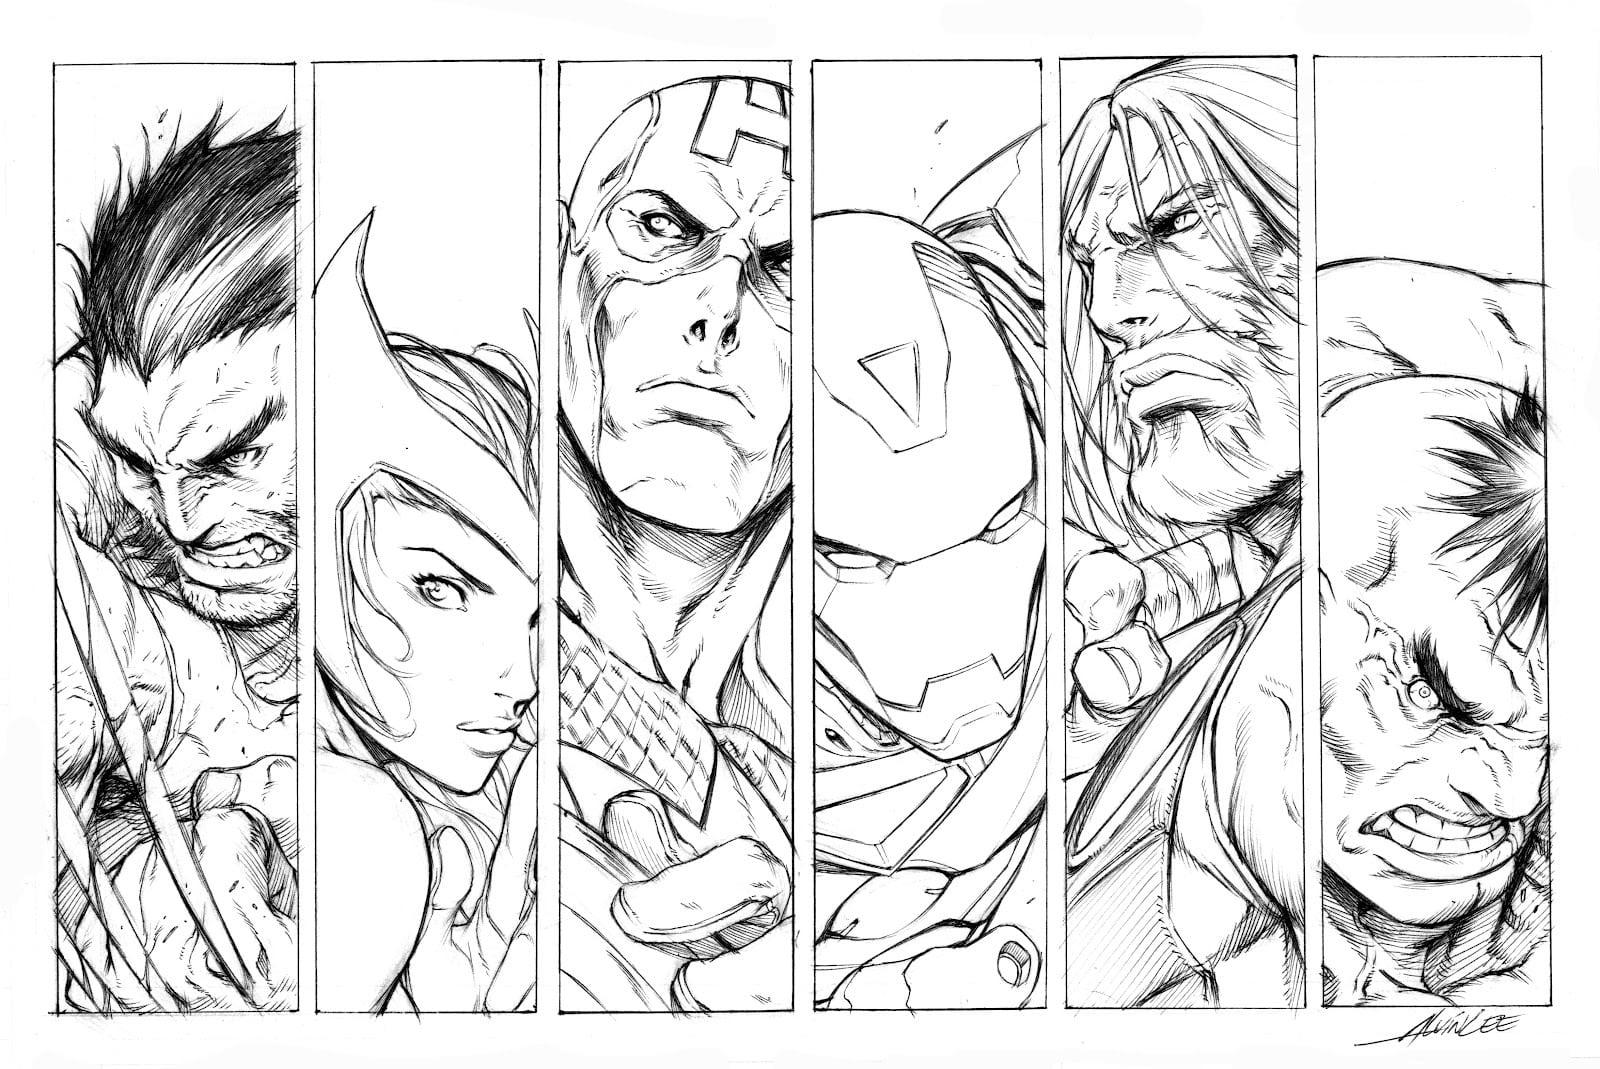 Os Vingadores – Desenhos Para Colorir, Pintar E Imprimir Gratis